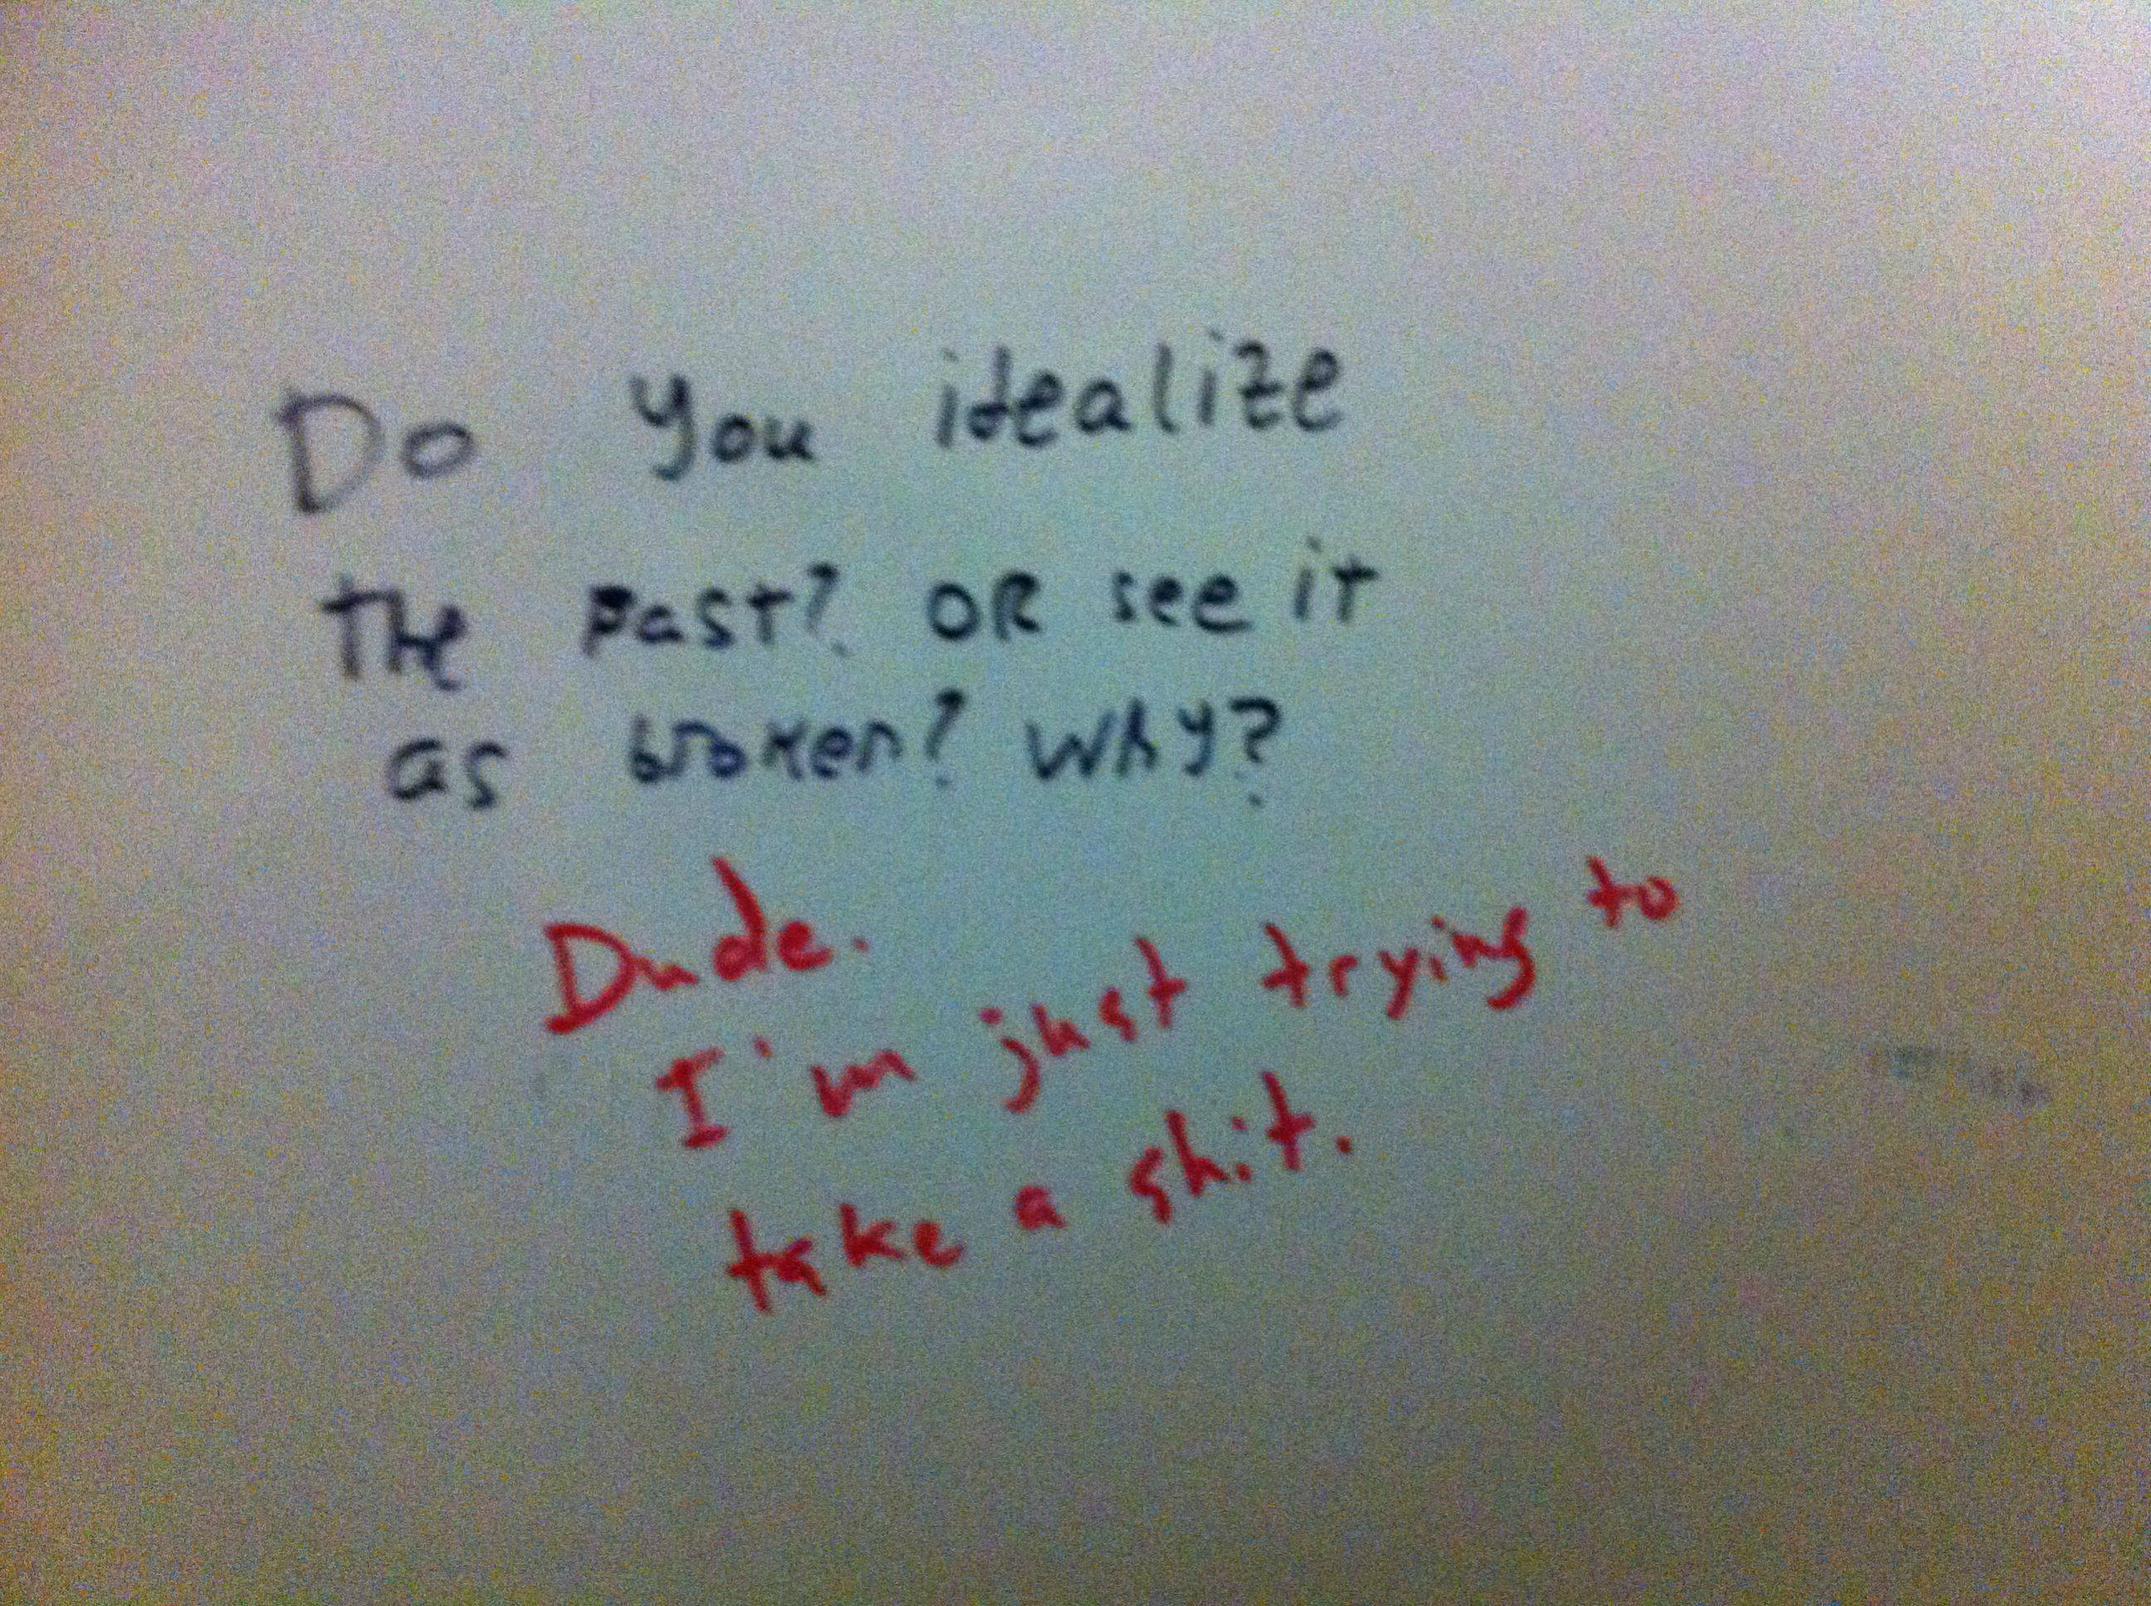 Funny Bathroom Wall Graffiti bathroom stall art is the purest form - healthydetroiter